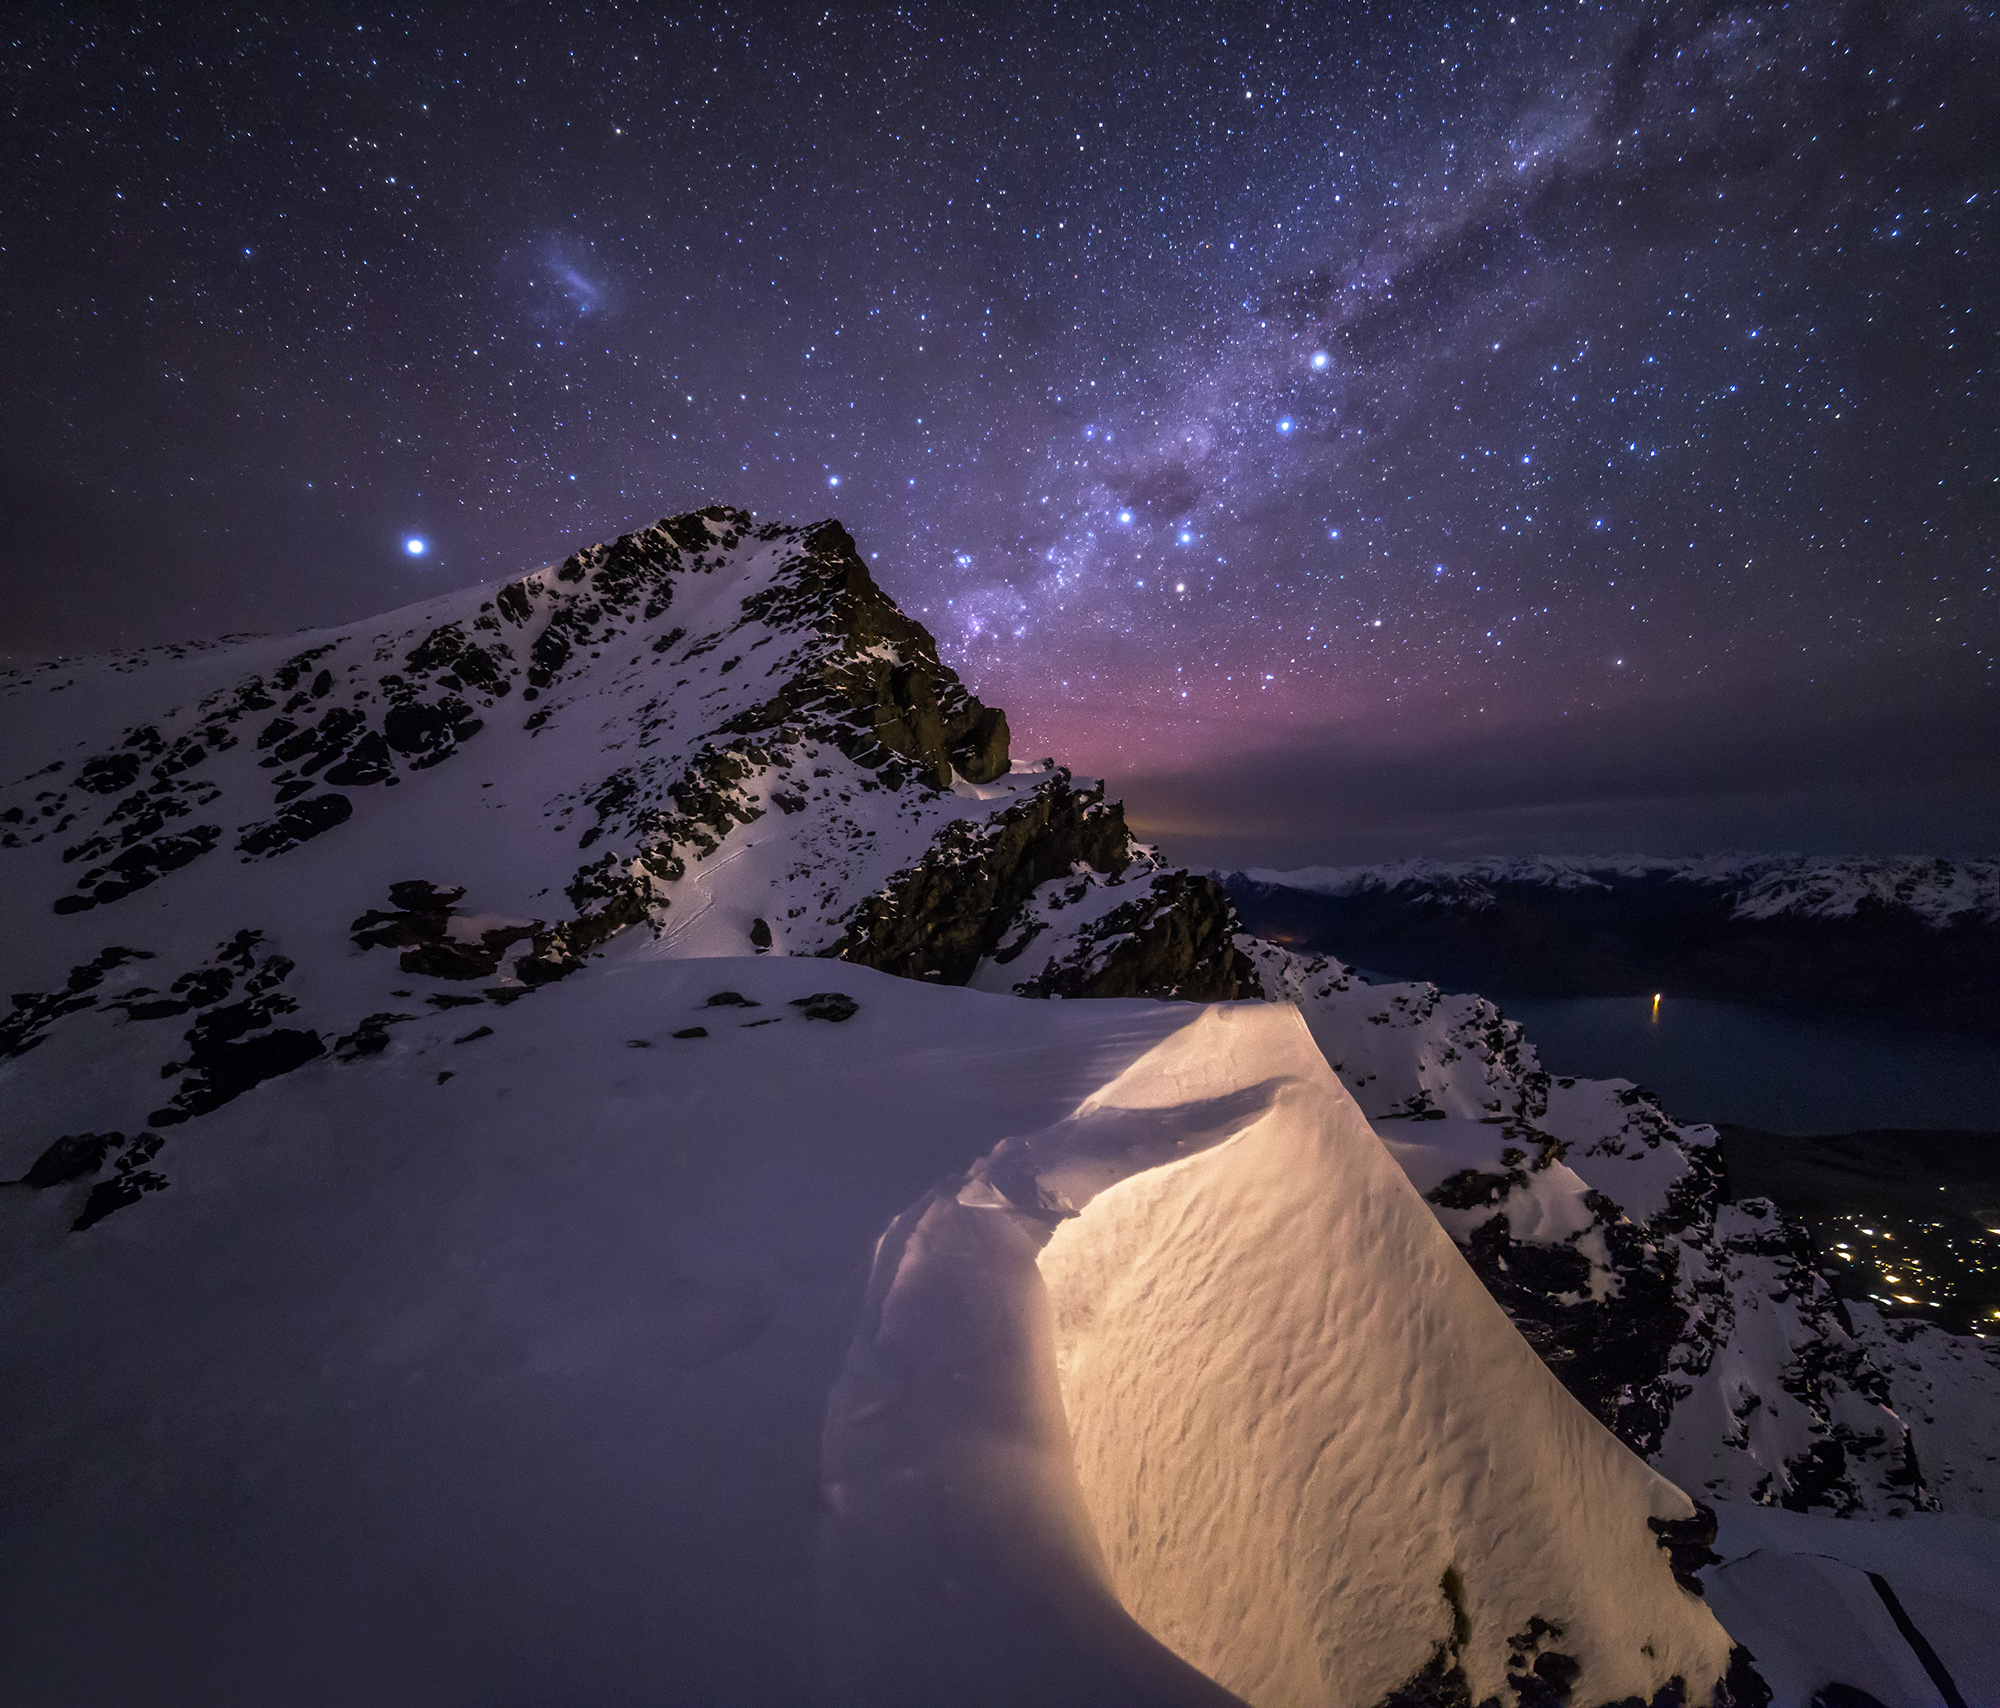 Milky Way Wallpaper: On The Edge Of Milky Way HD Wallpaper